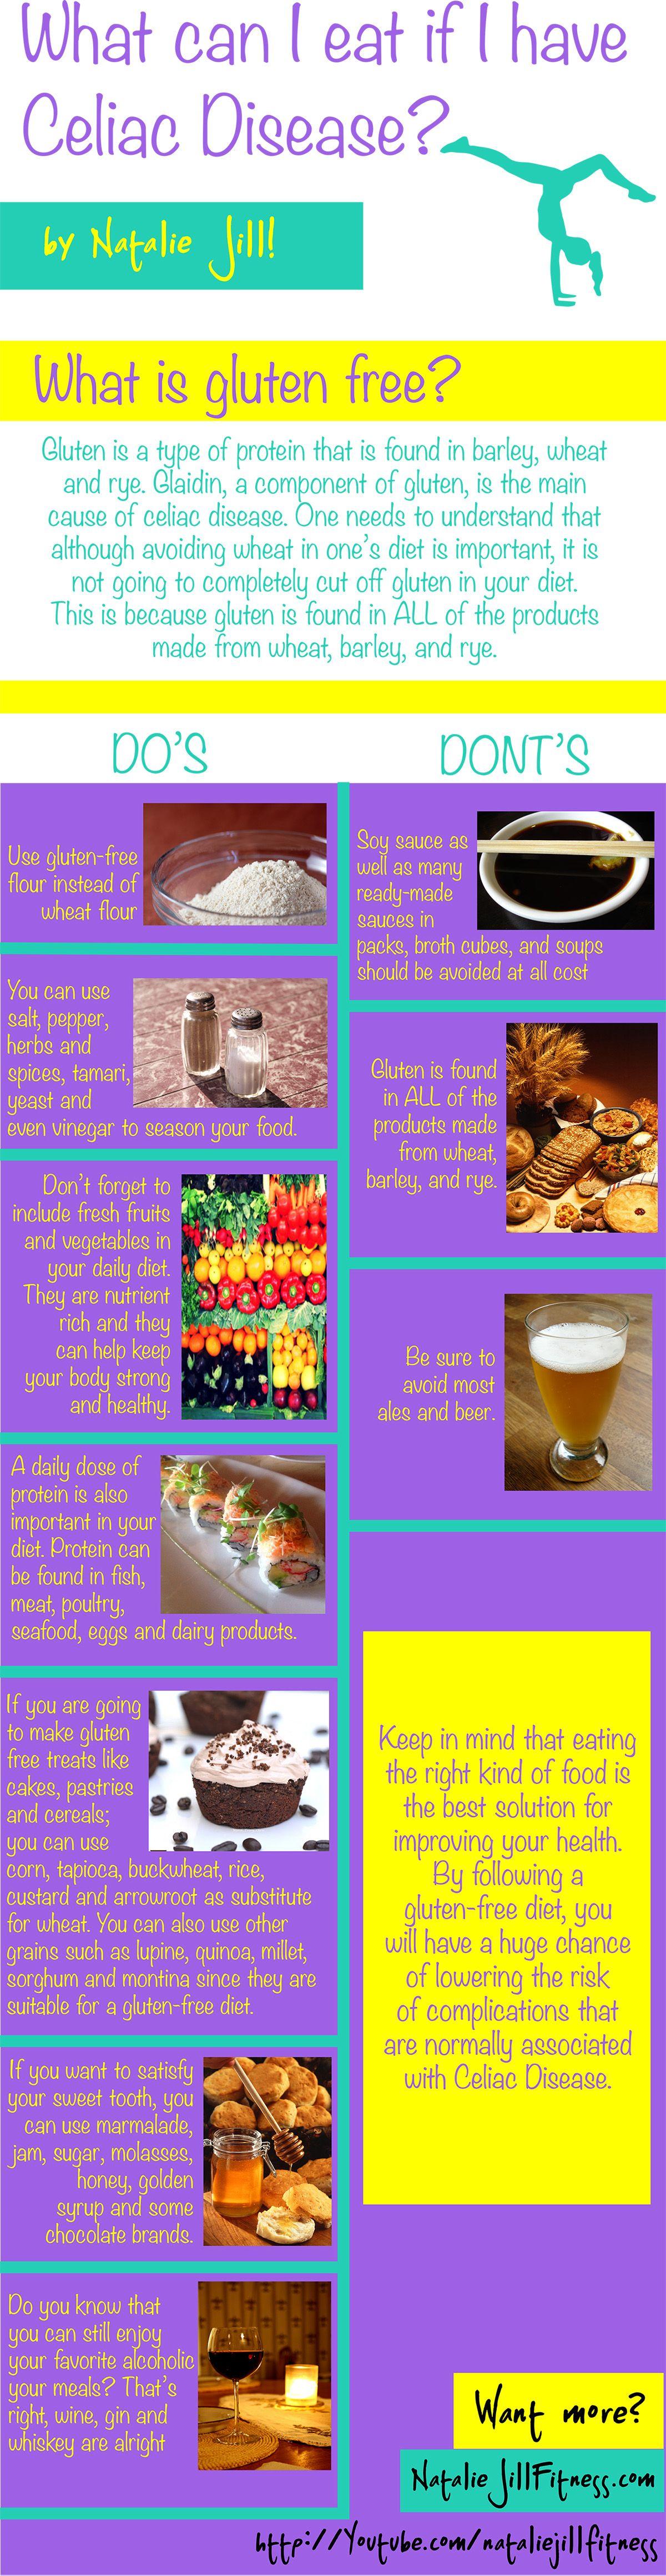 What Can Celiacs Eat | Celiac, Celiac disease diet, Celiac ...